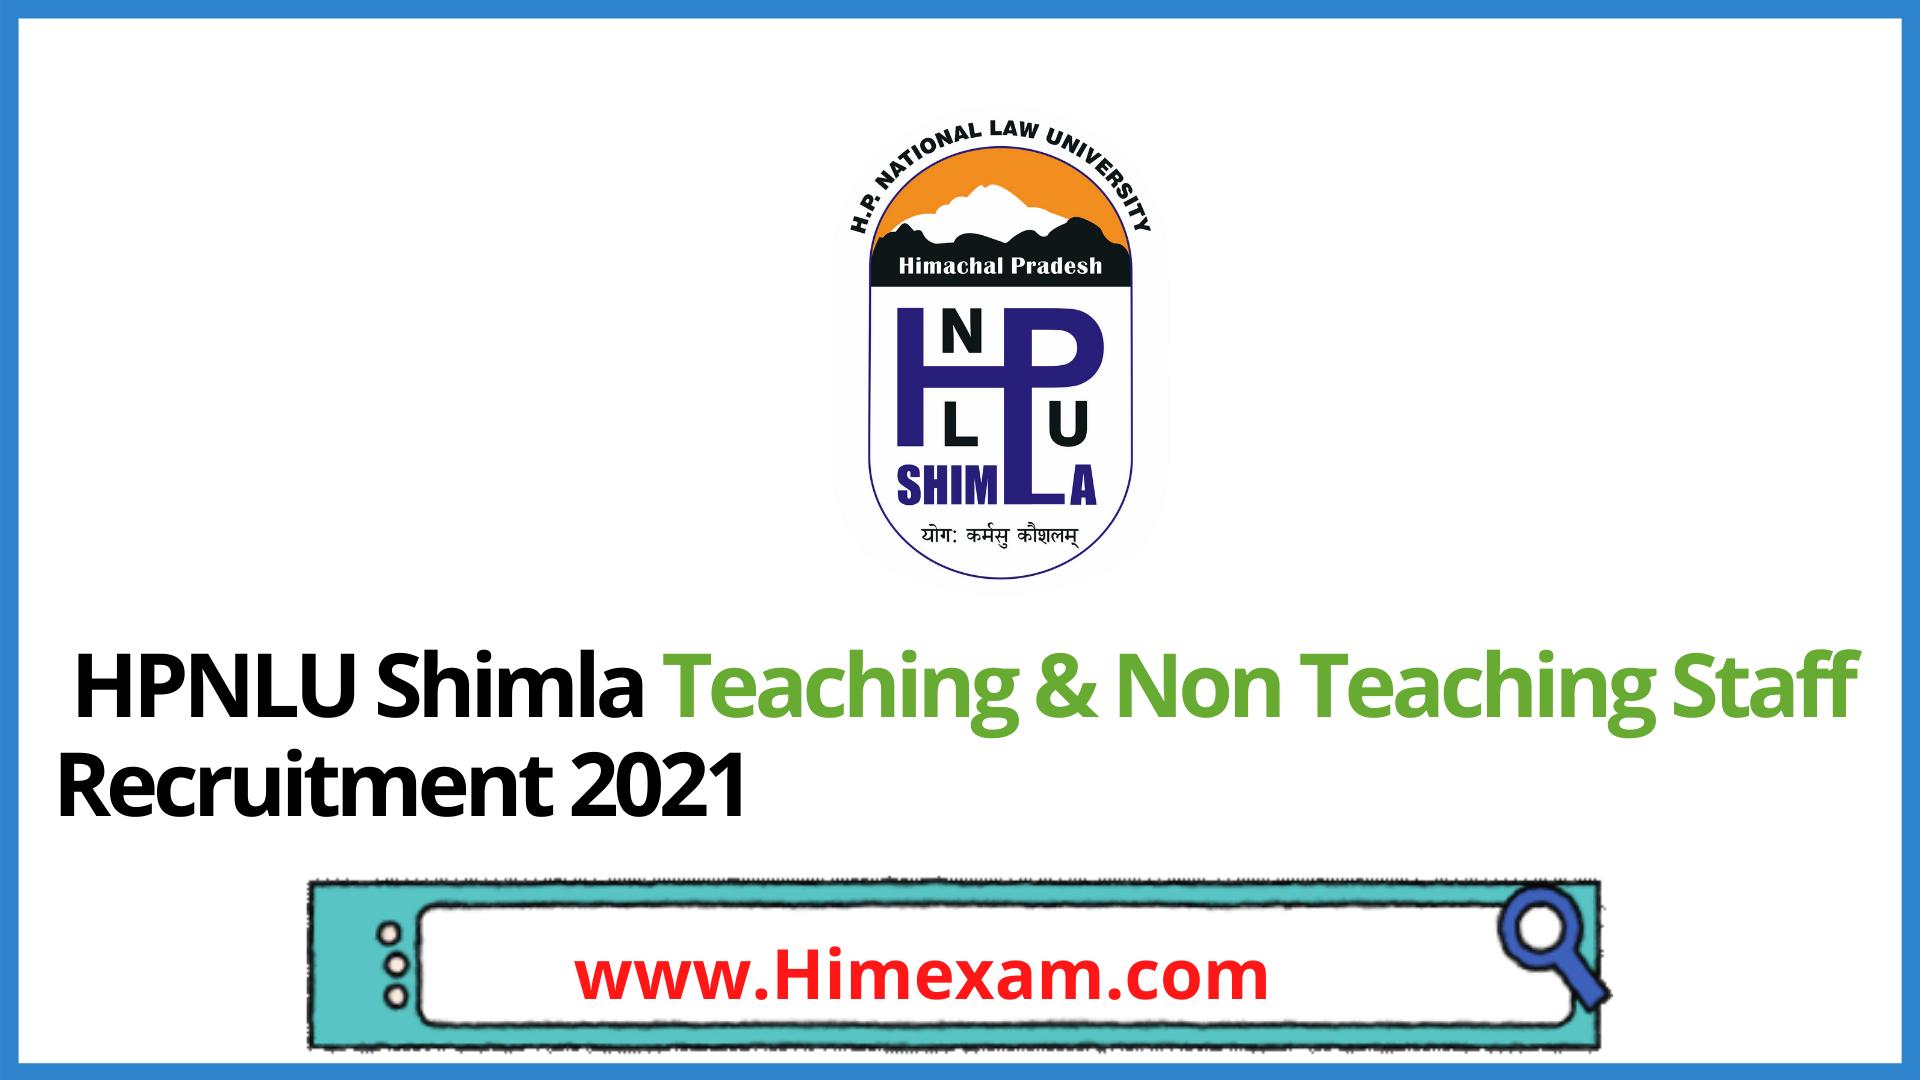 HPNLU Shimla Teaching & Non Teaching Staff Recruitment 2021